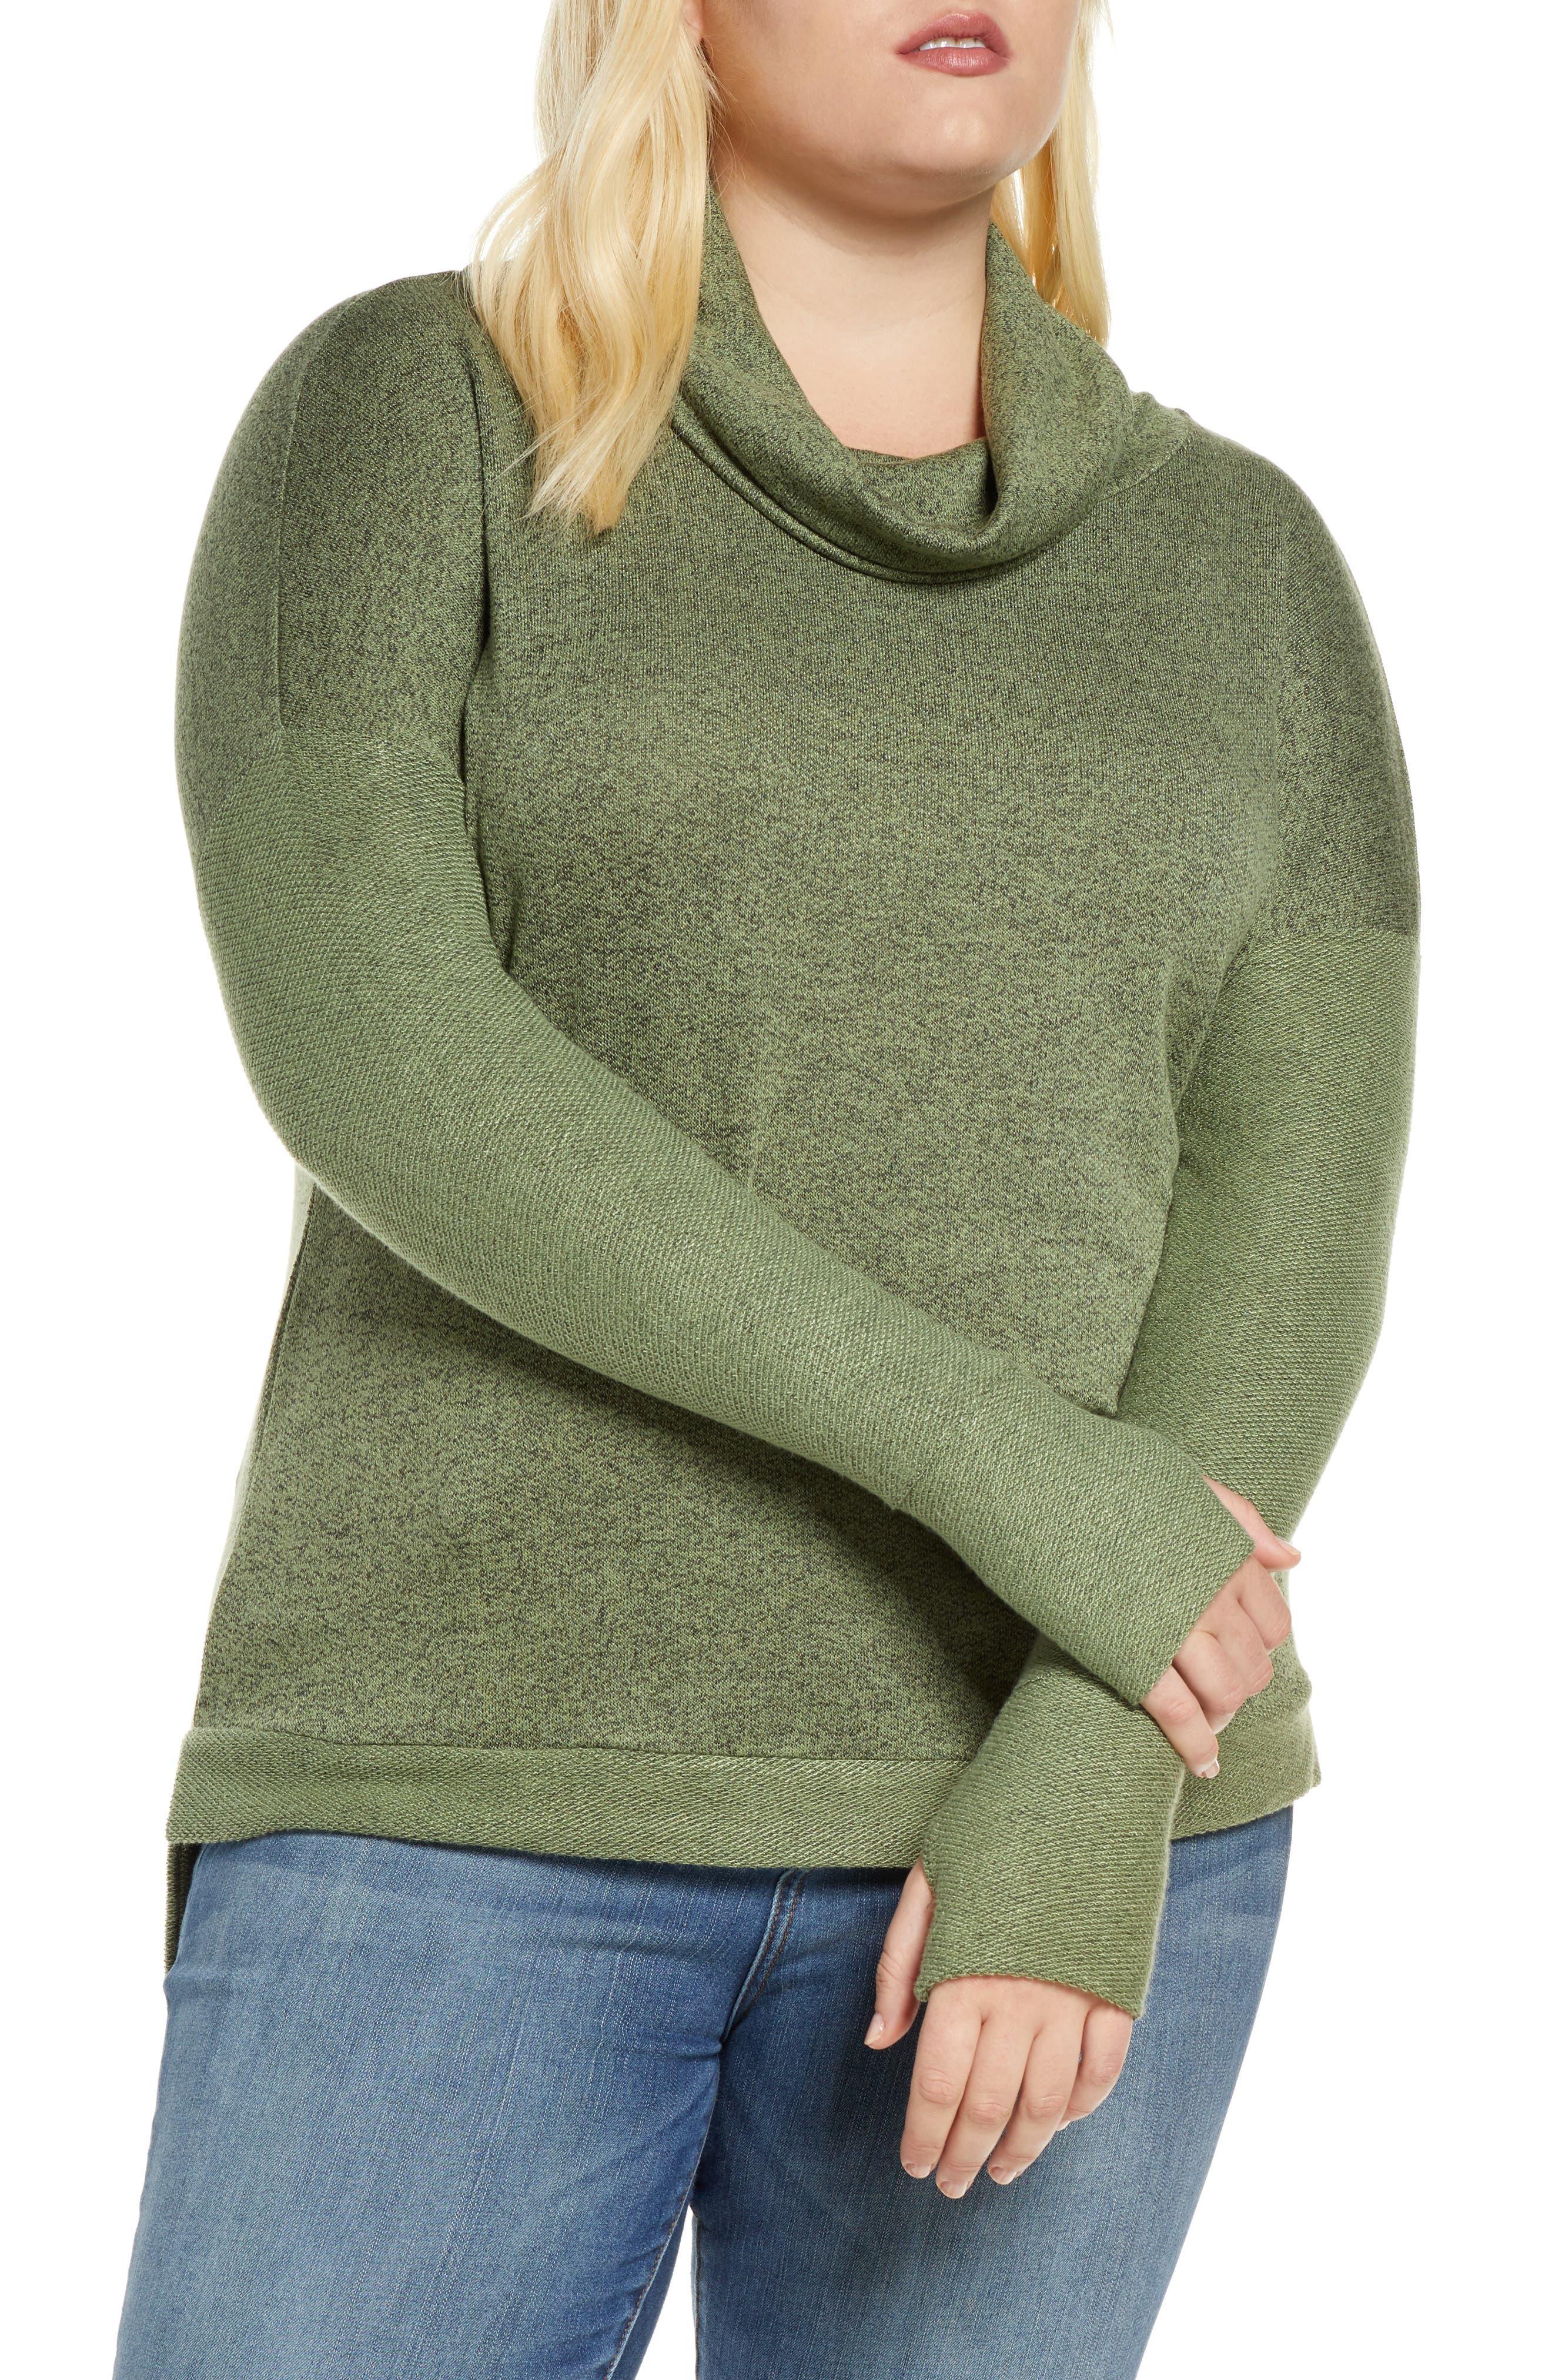 Plus Size Women's Loveapella Reverse Contrast Cowl Neck Long Sleeve Top